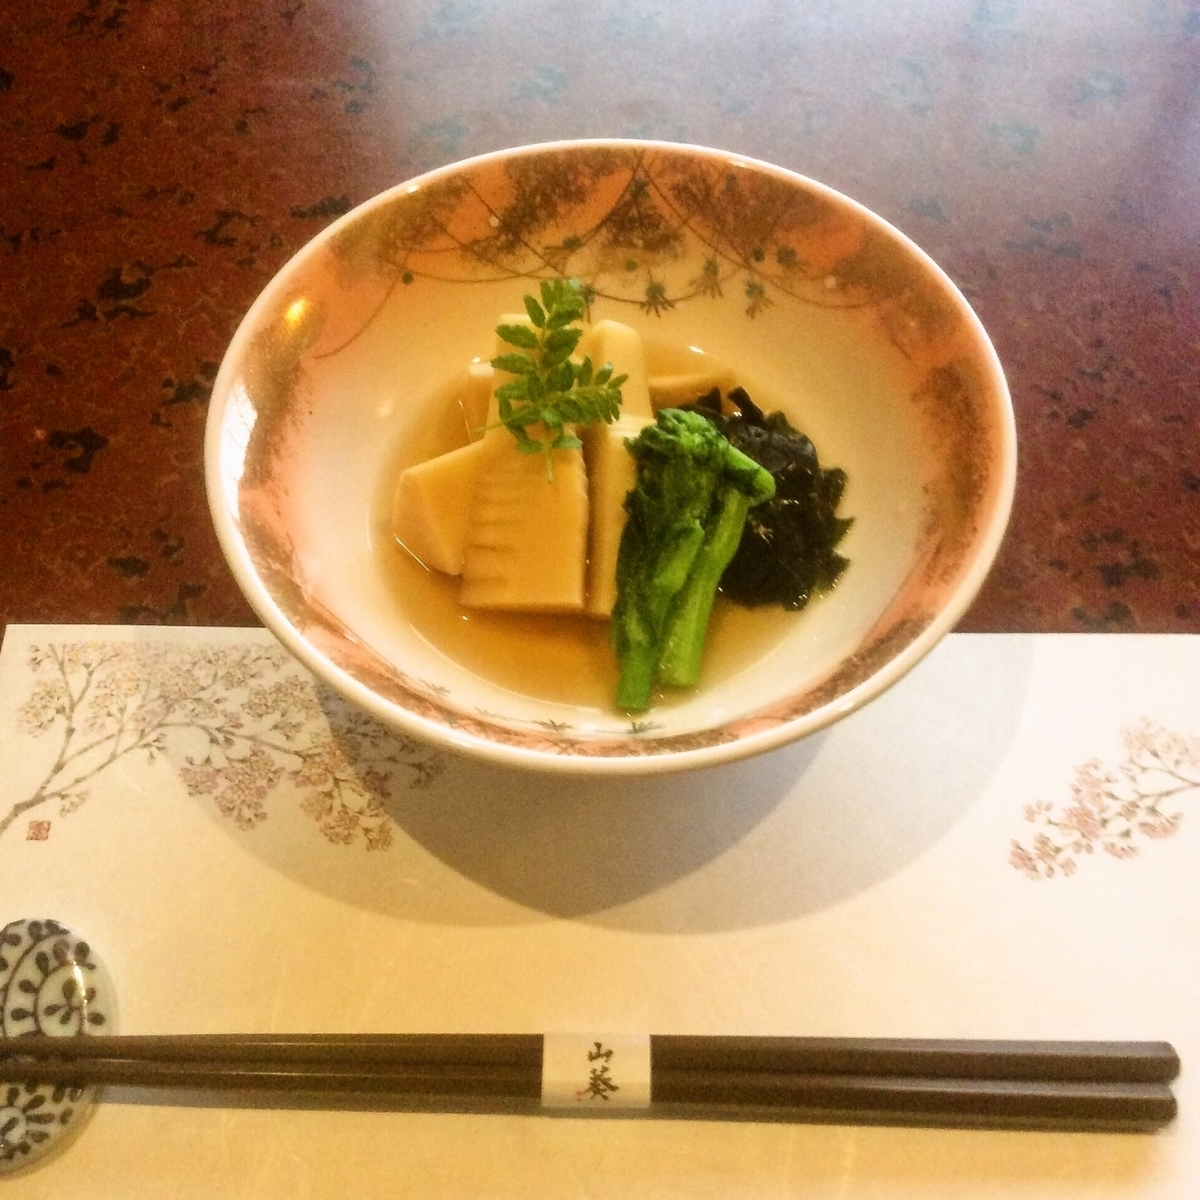 Boiled Wakatake